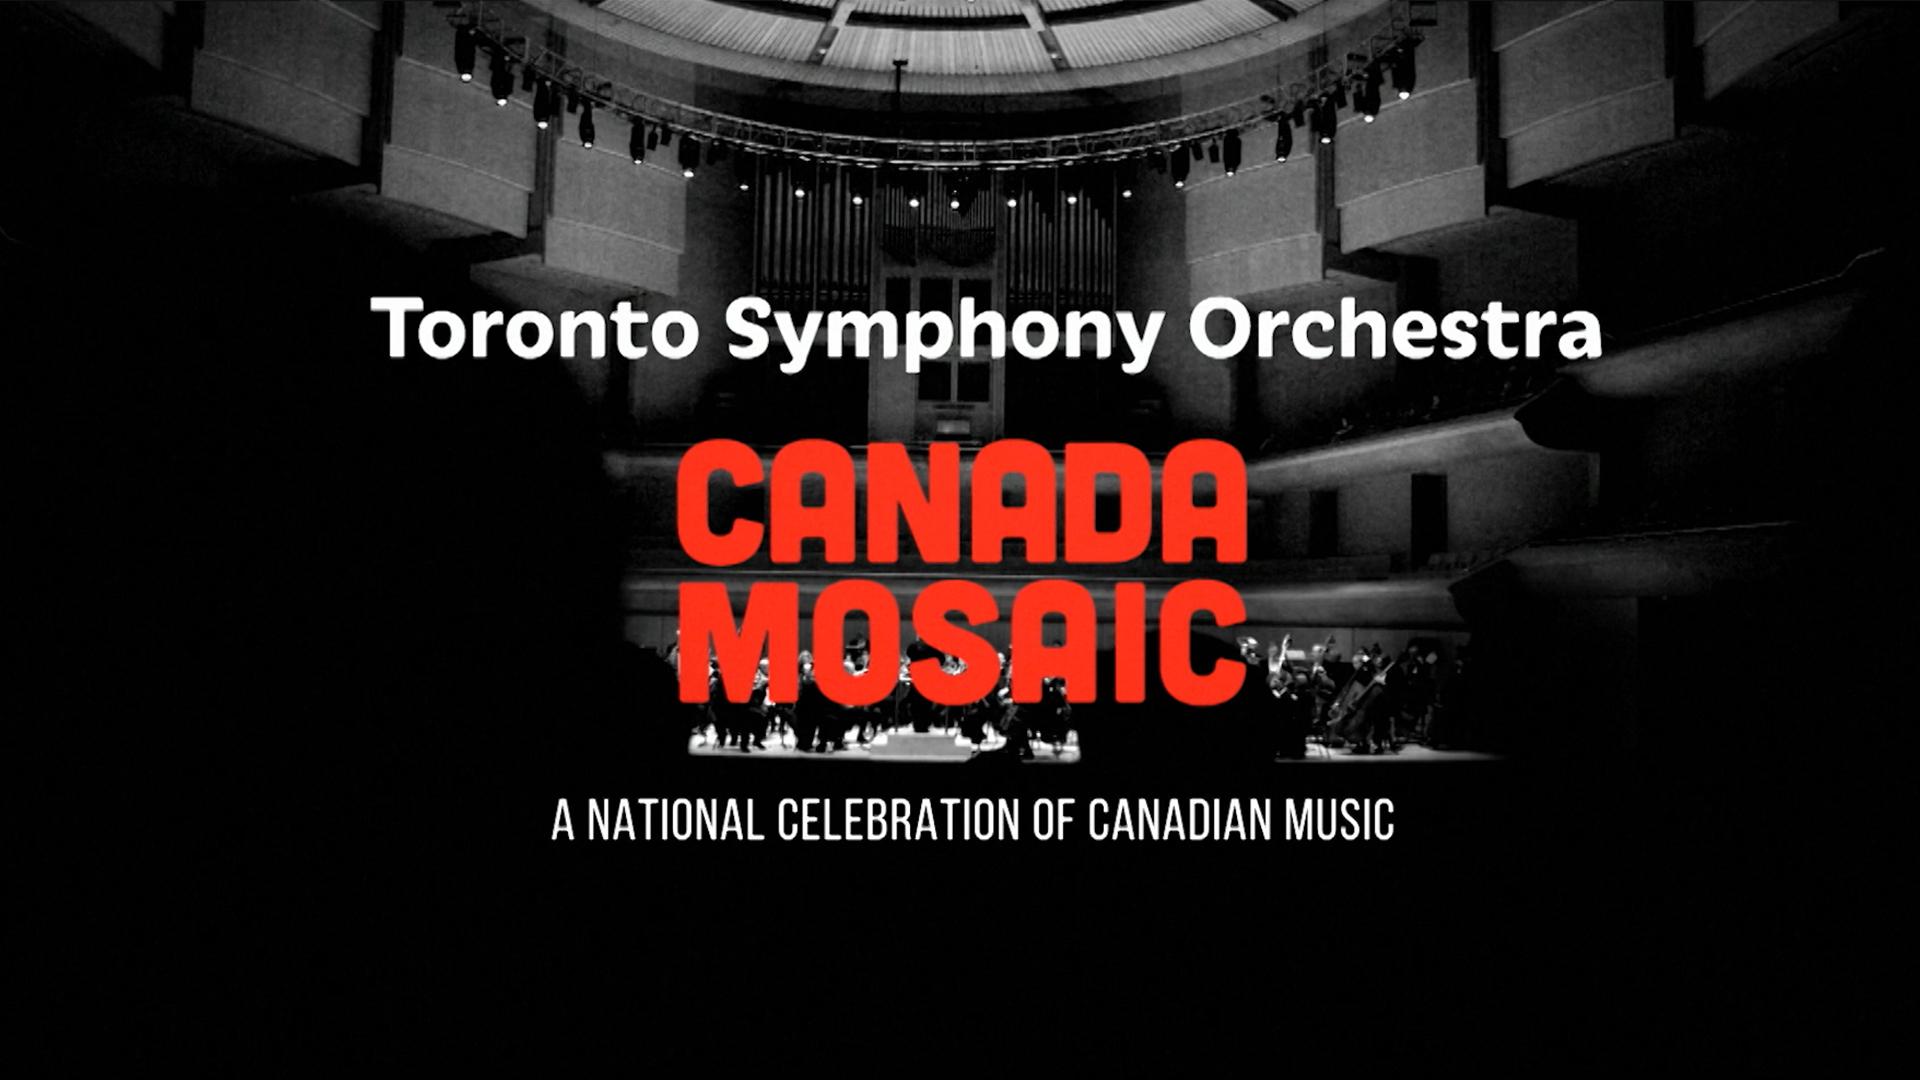 Toronto Symphony Orchestra Canada Mosaic